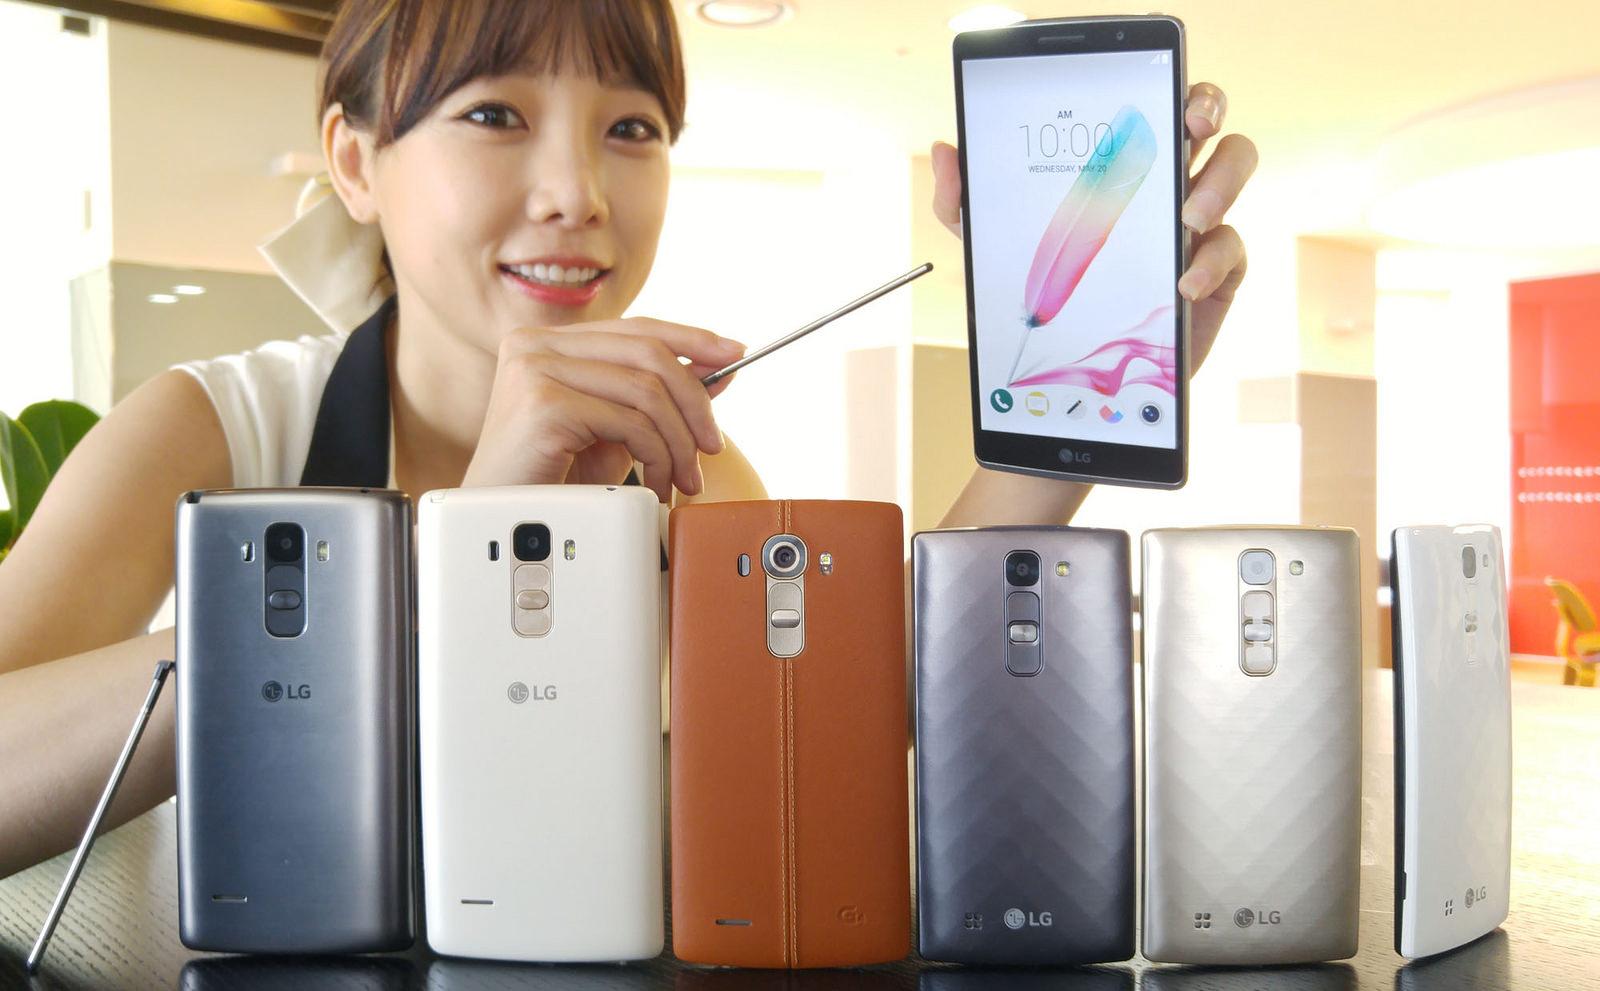 Od lewej: LG G4 Stylus, LG G4, LG G4c